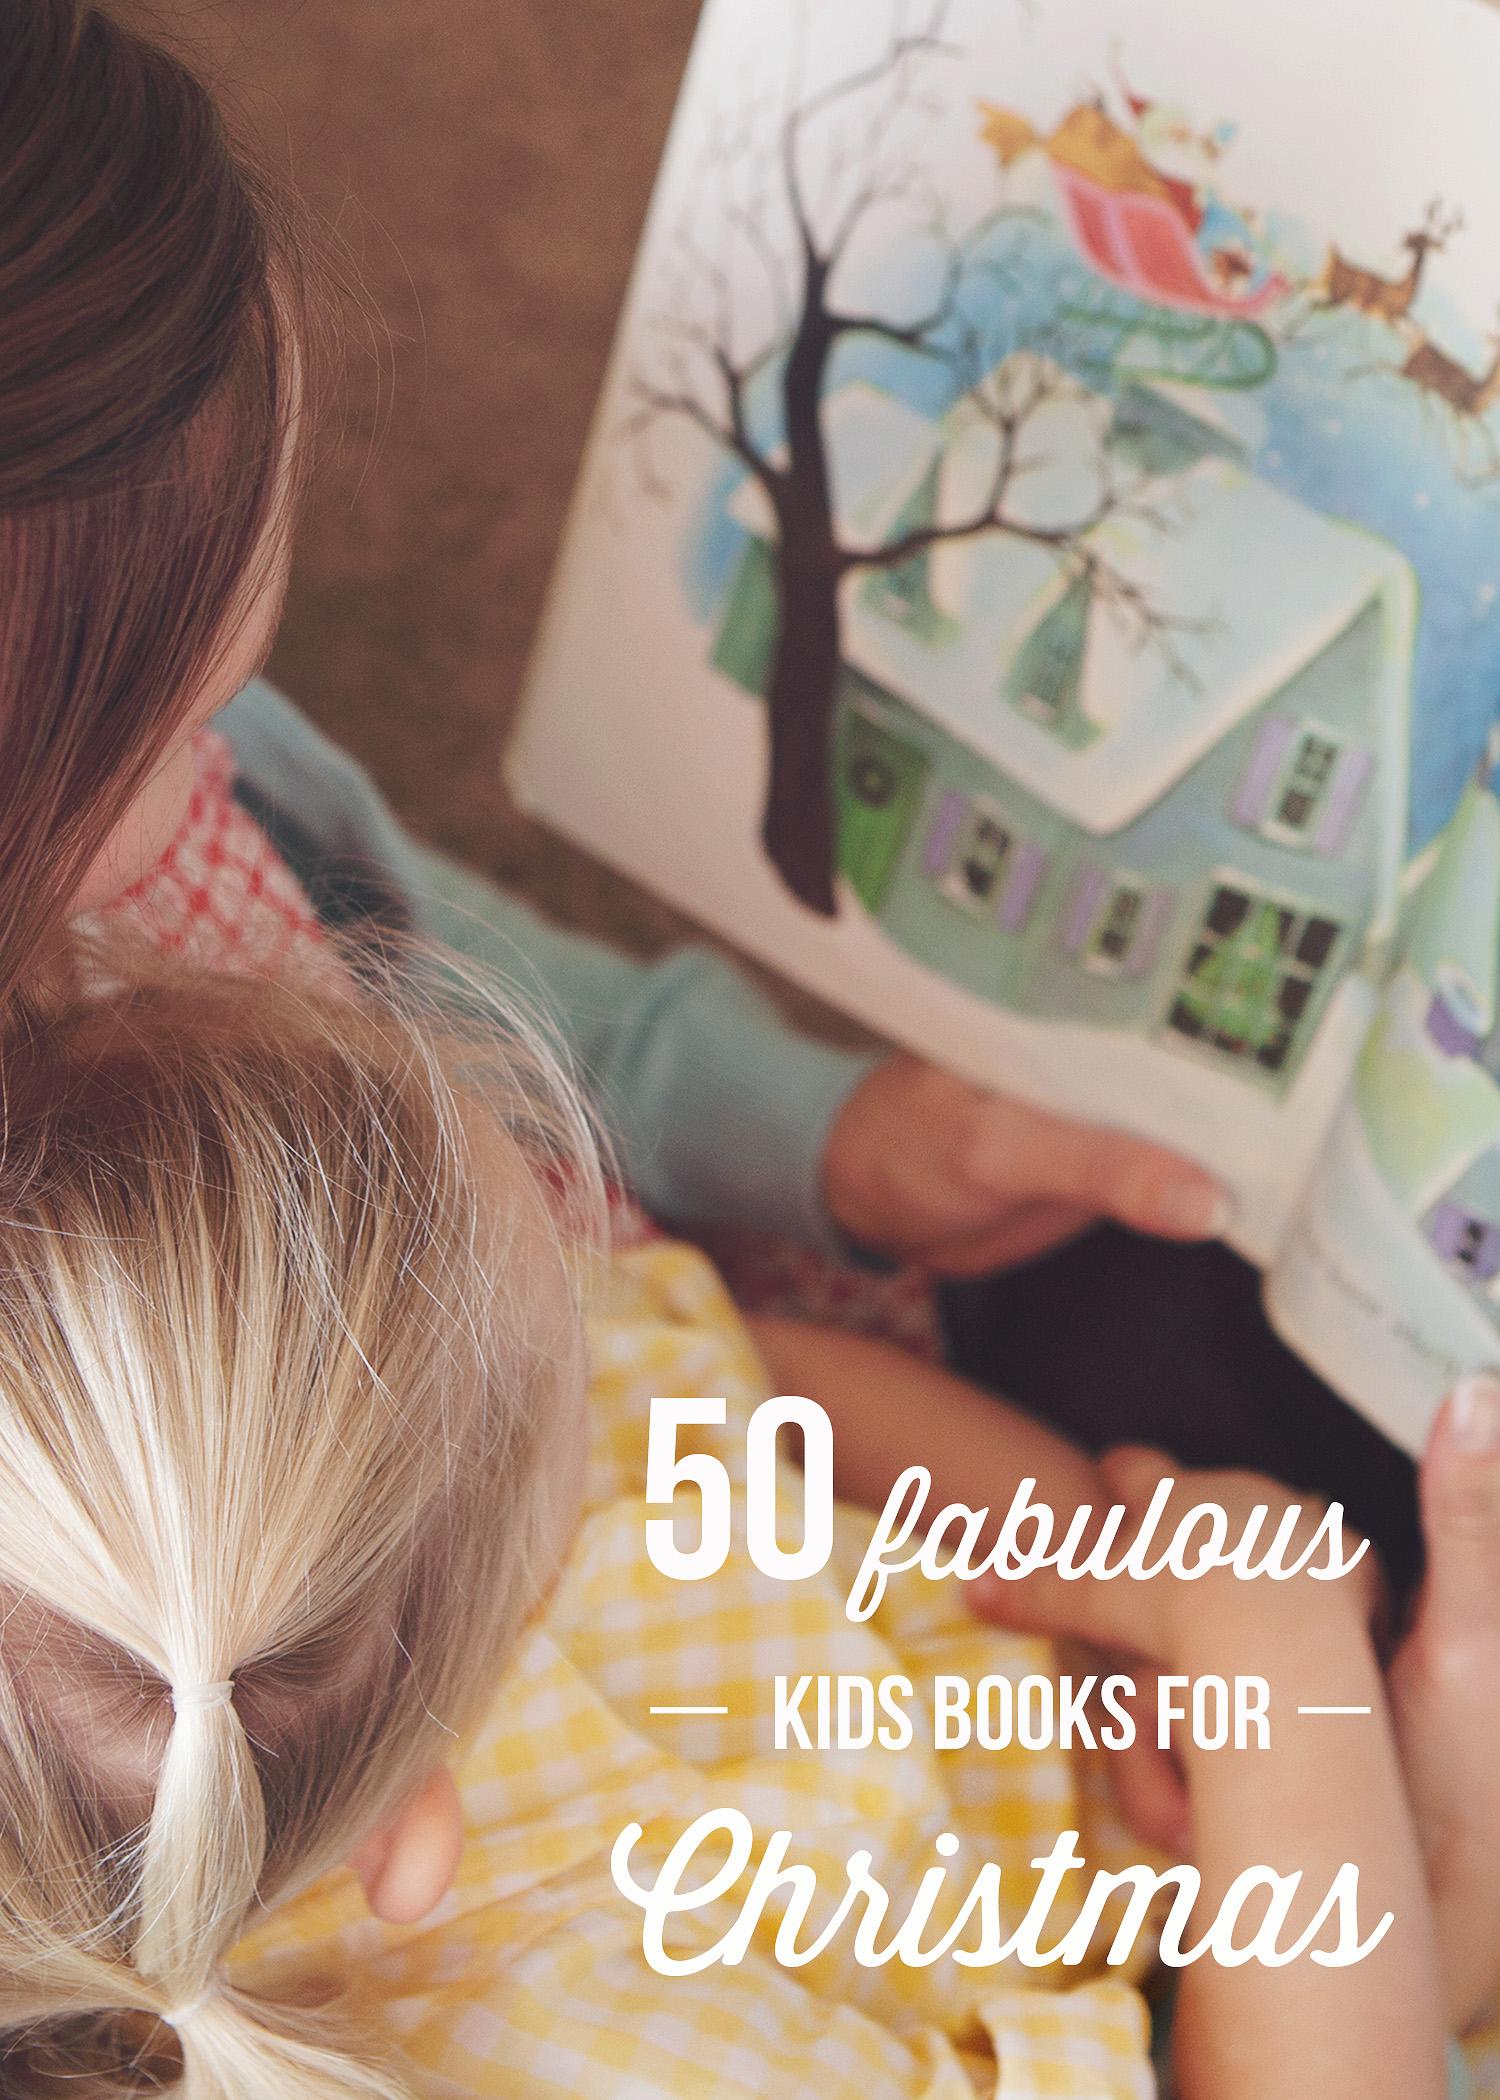 50 Fabulous Christmas Books for Kids